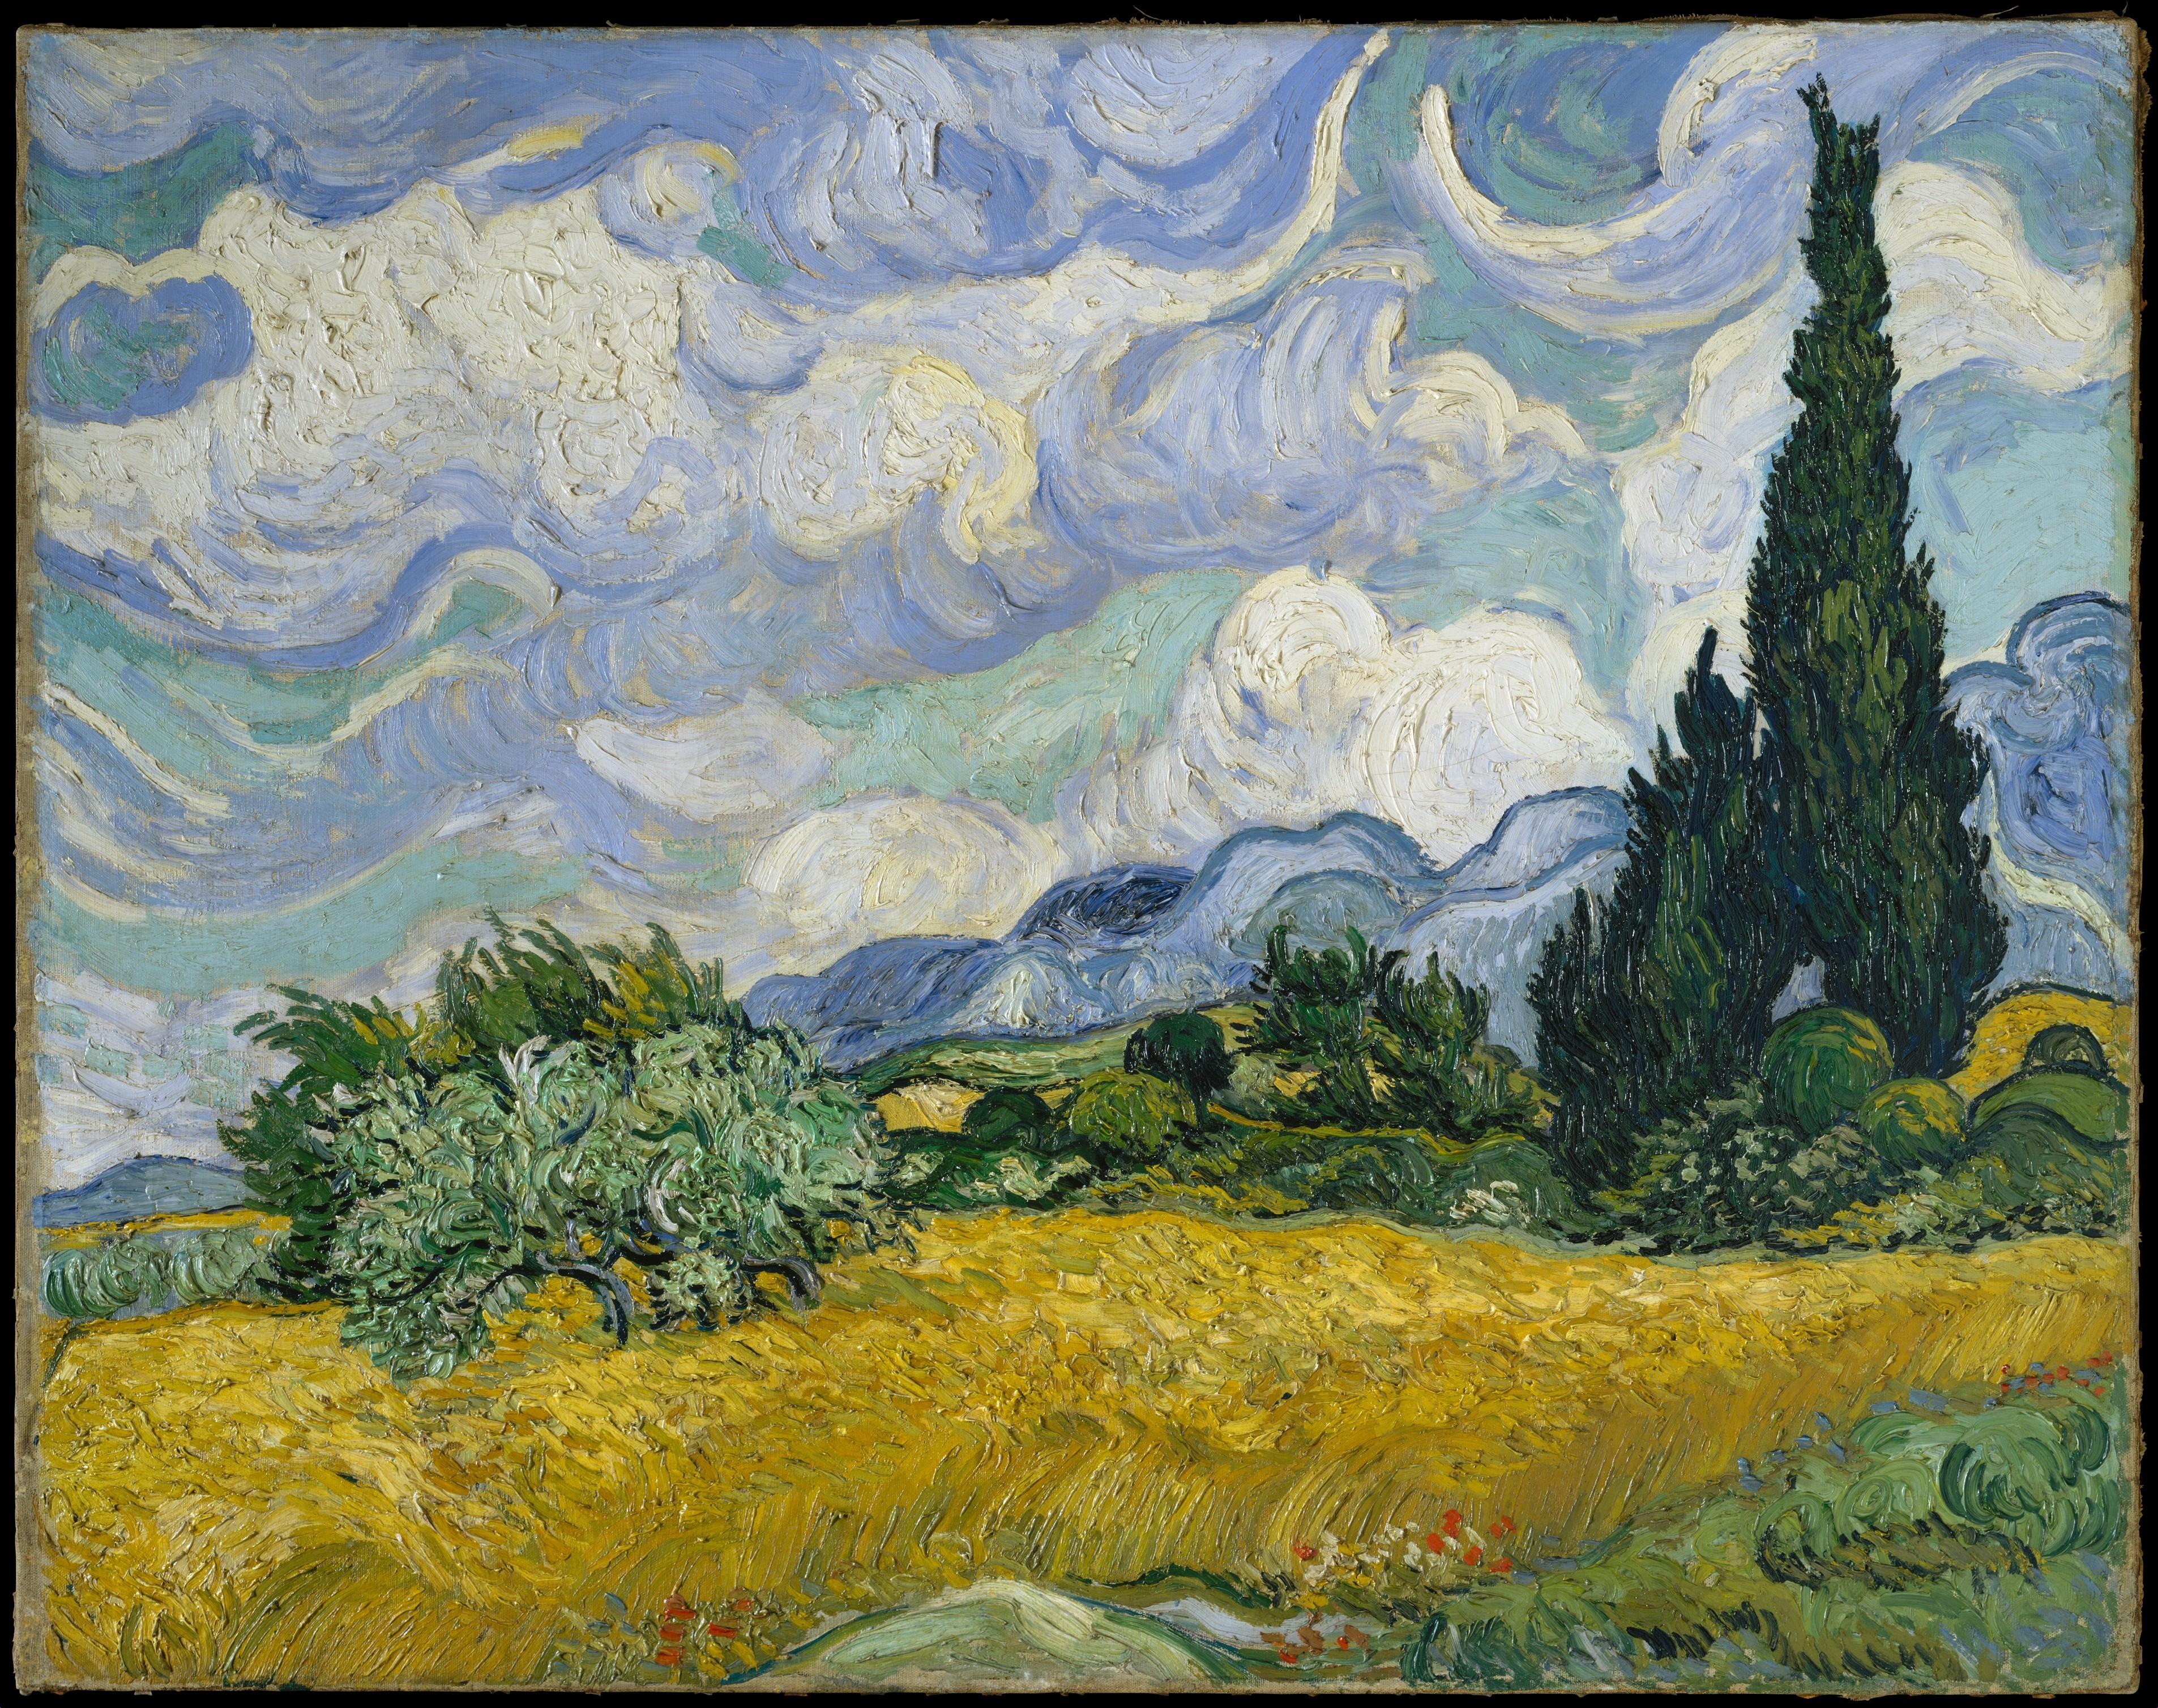 The_Met โหลดฟรี Vincent Van Gogh งานศิลปะ